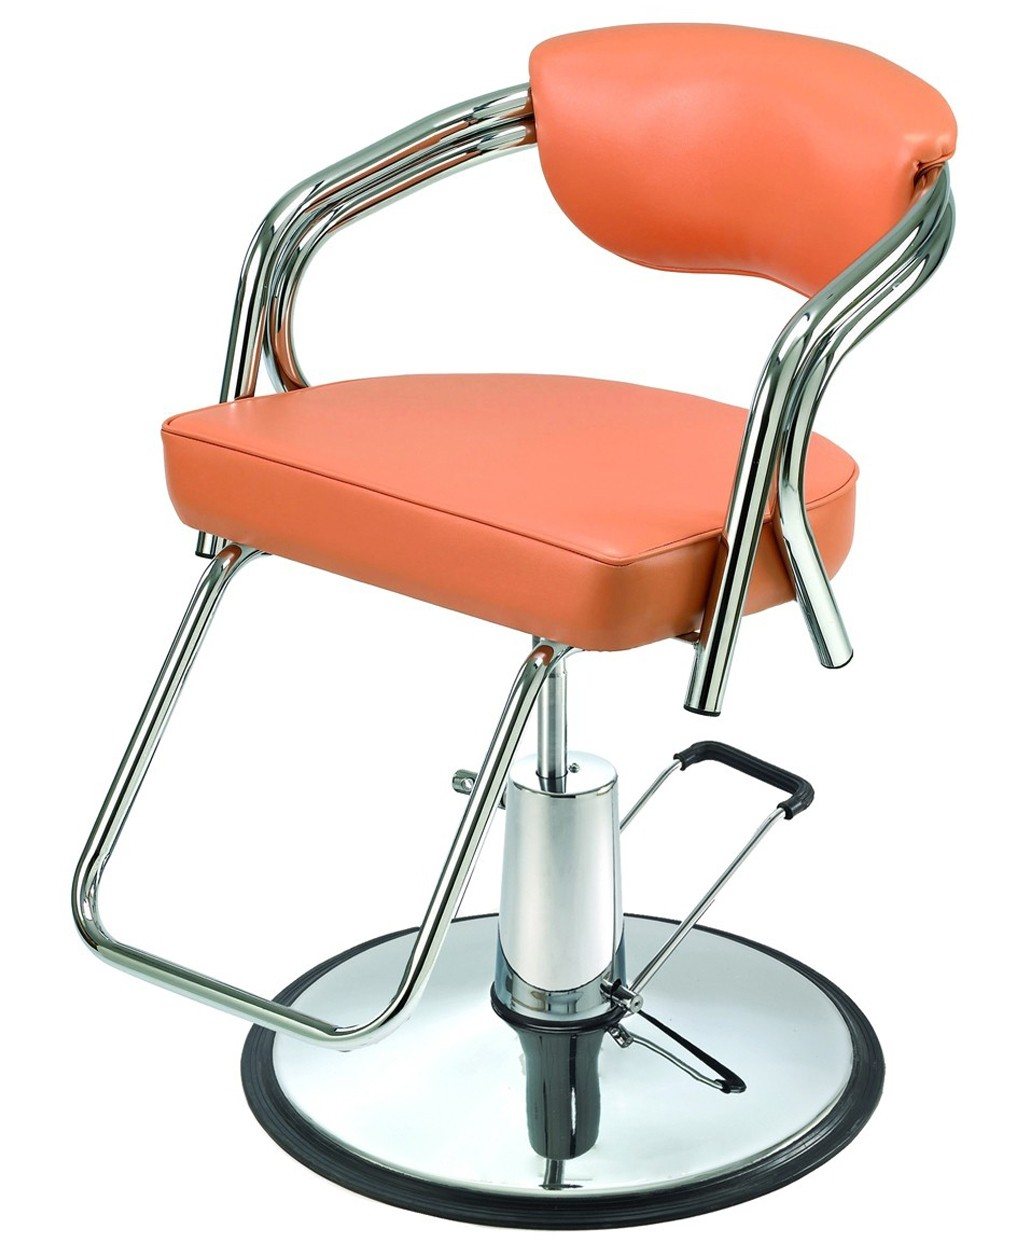 Pibbs 4606 Americana Styling Chair